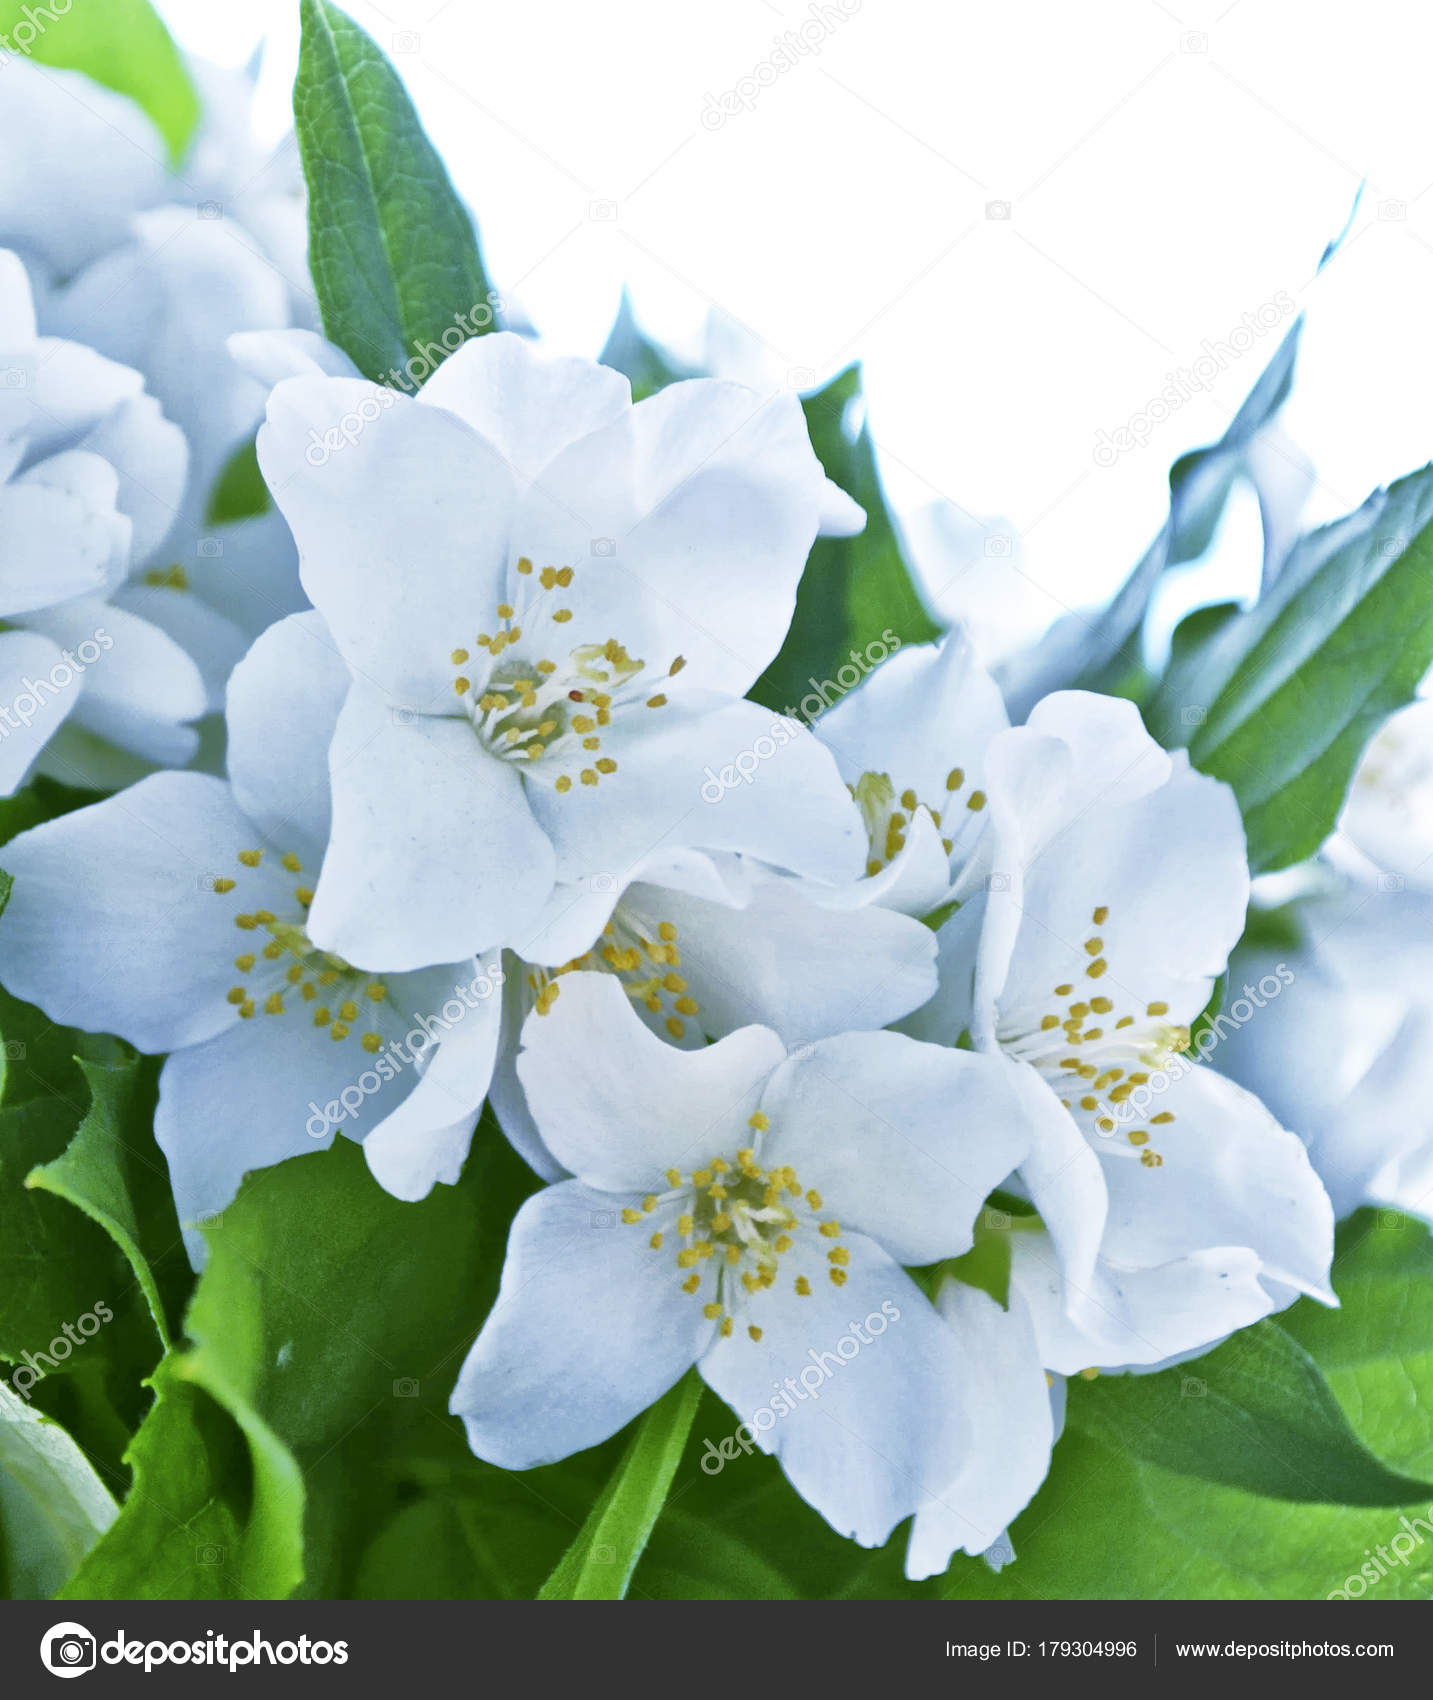 Картинка посадка цветов